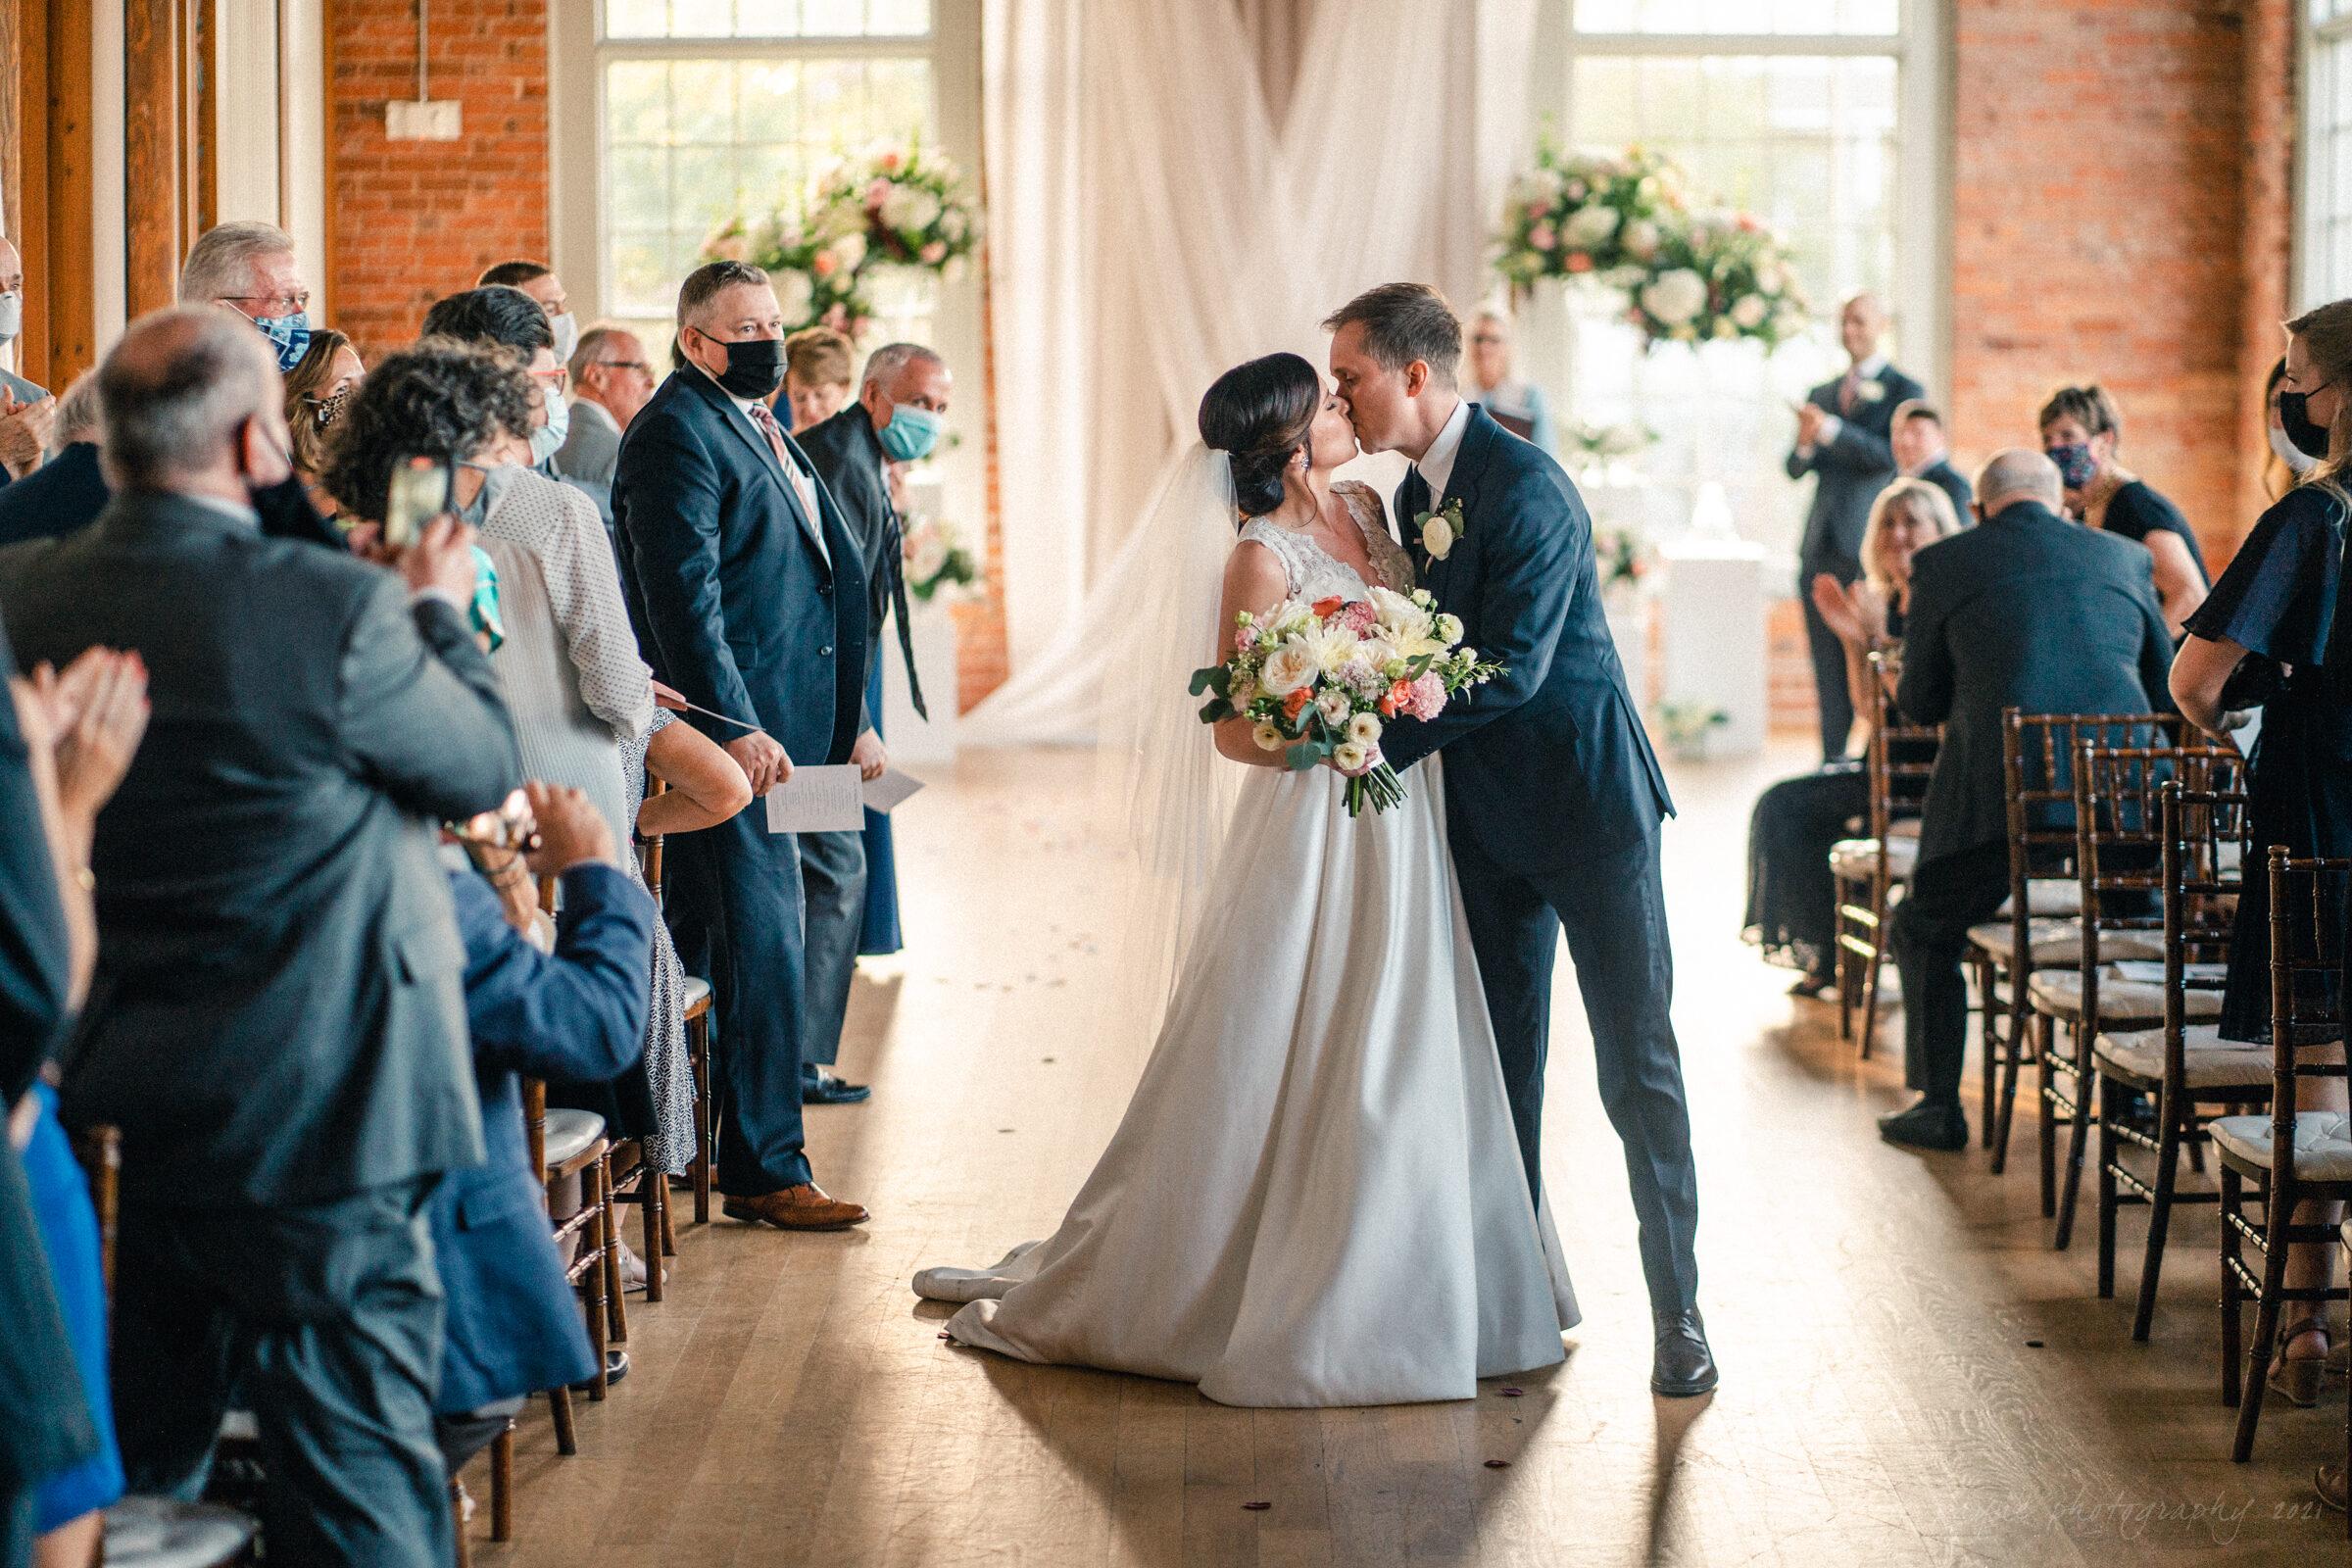 Cotton Room Wedding Photographer Kate Martin 30